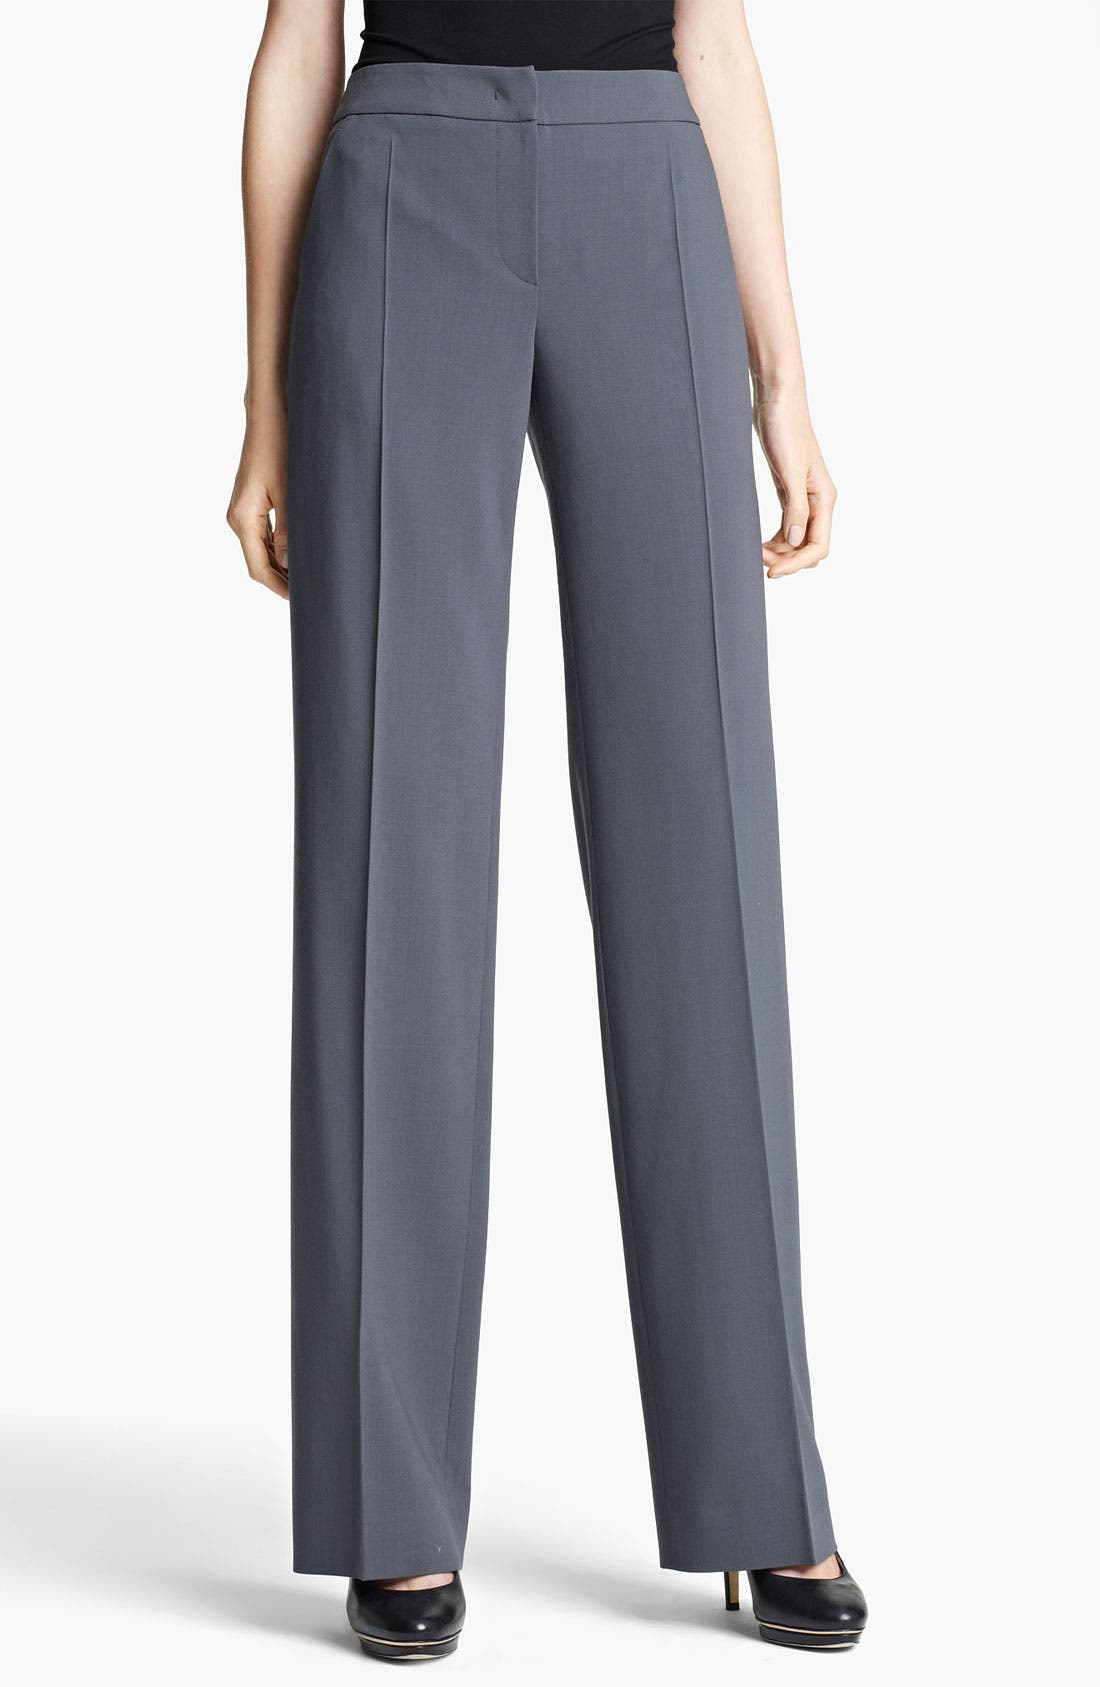 Alternate Image 1 Selected - Armani Collezioni Stretch Wool Pants